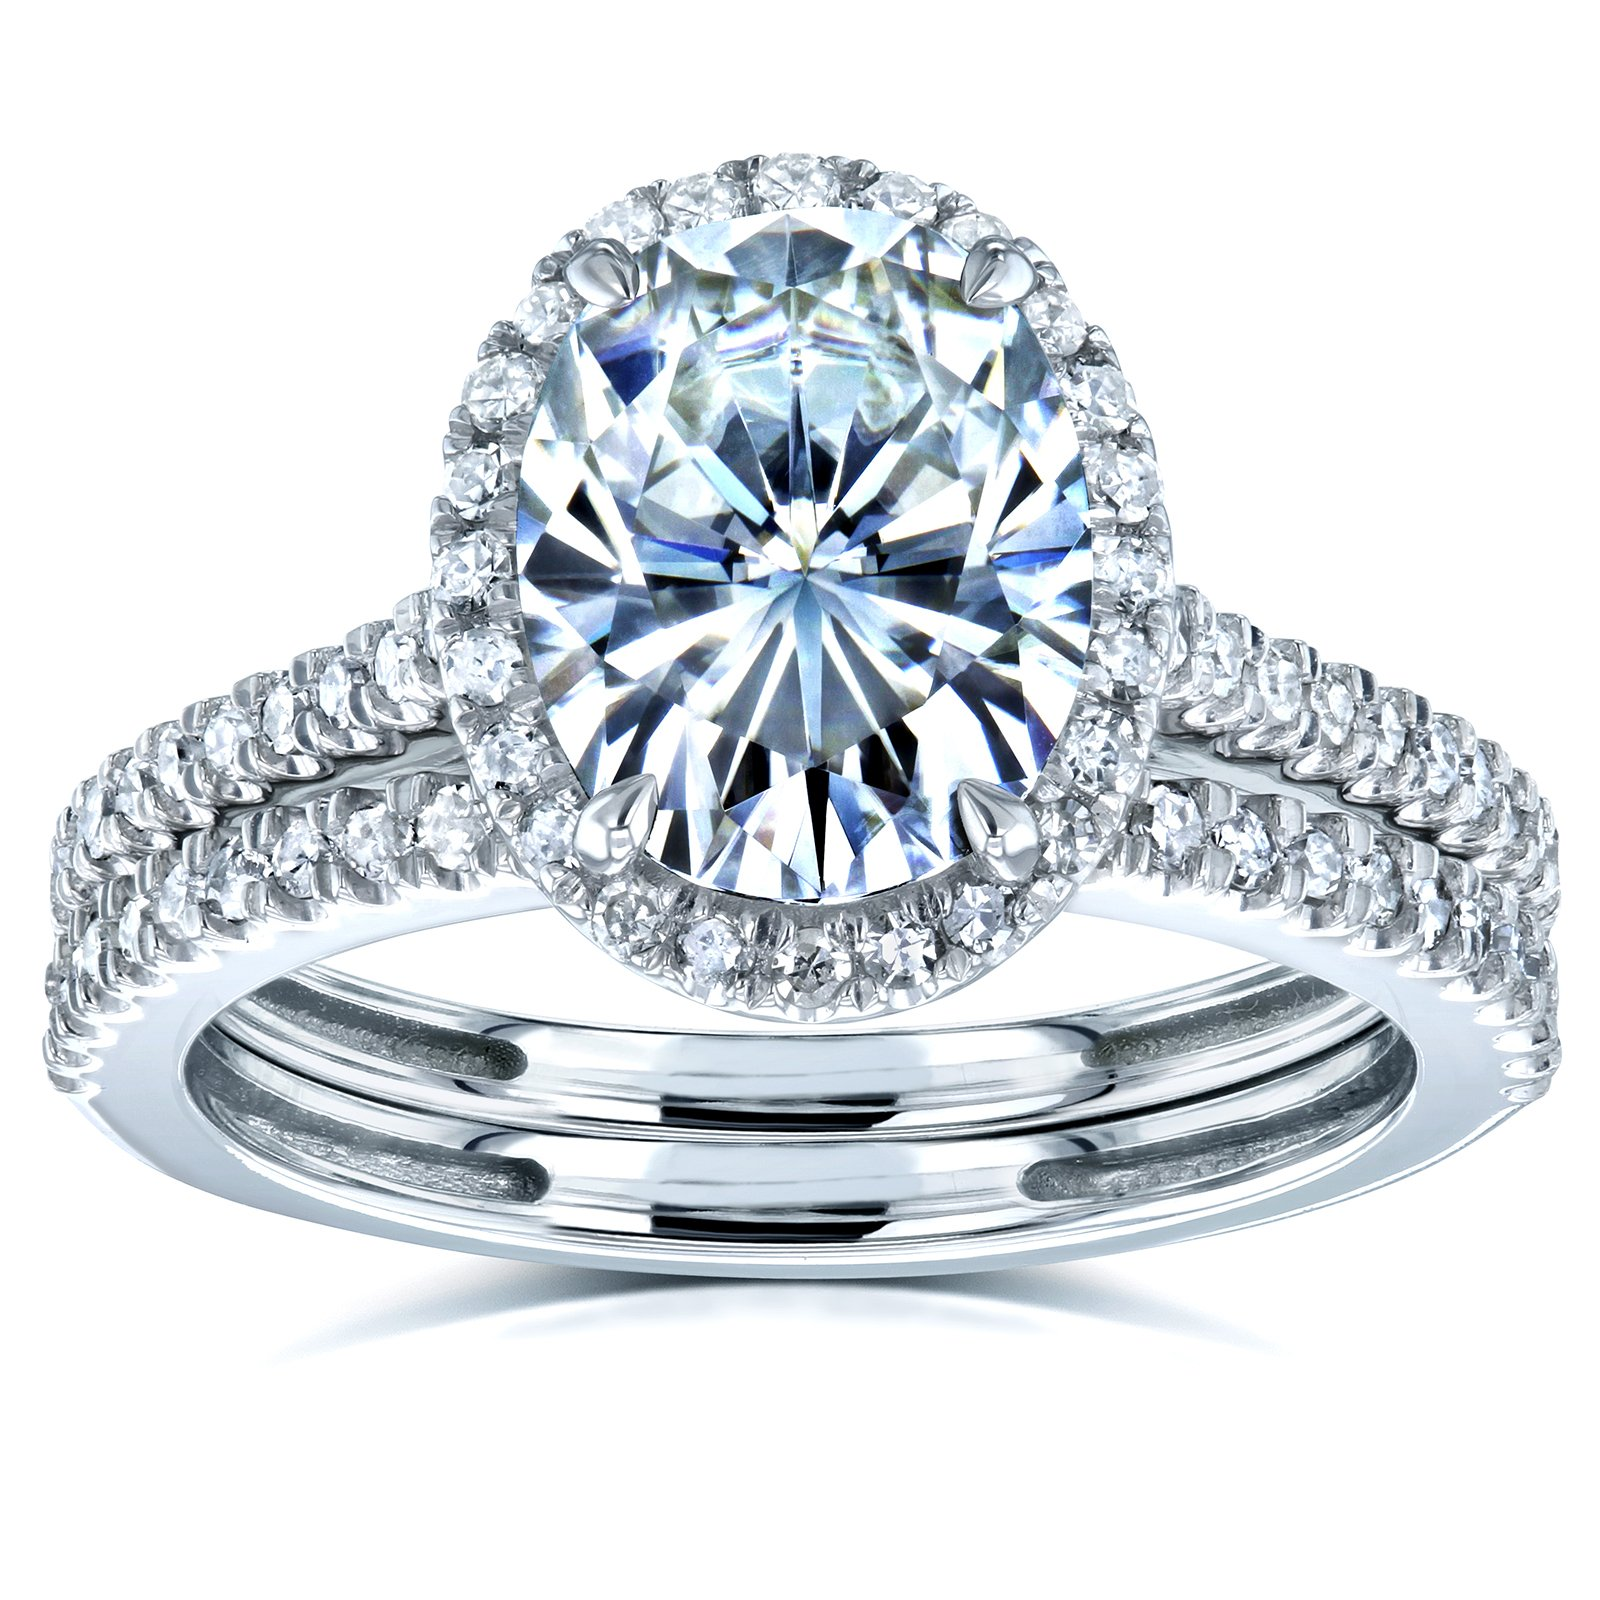 Oval Moissanite and Diamond Halo Bridal Rings Set 2 3/8 CTW 14k White Gold, 10